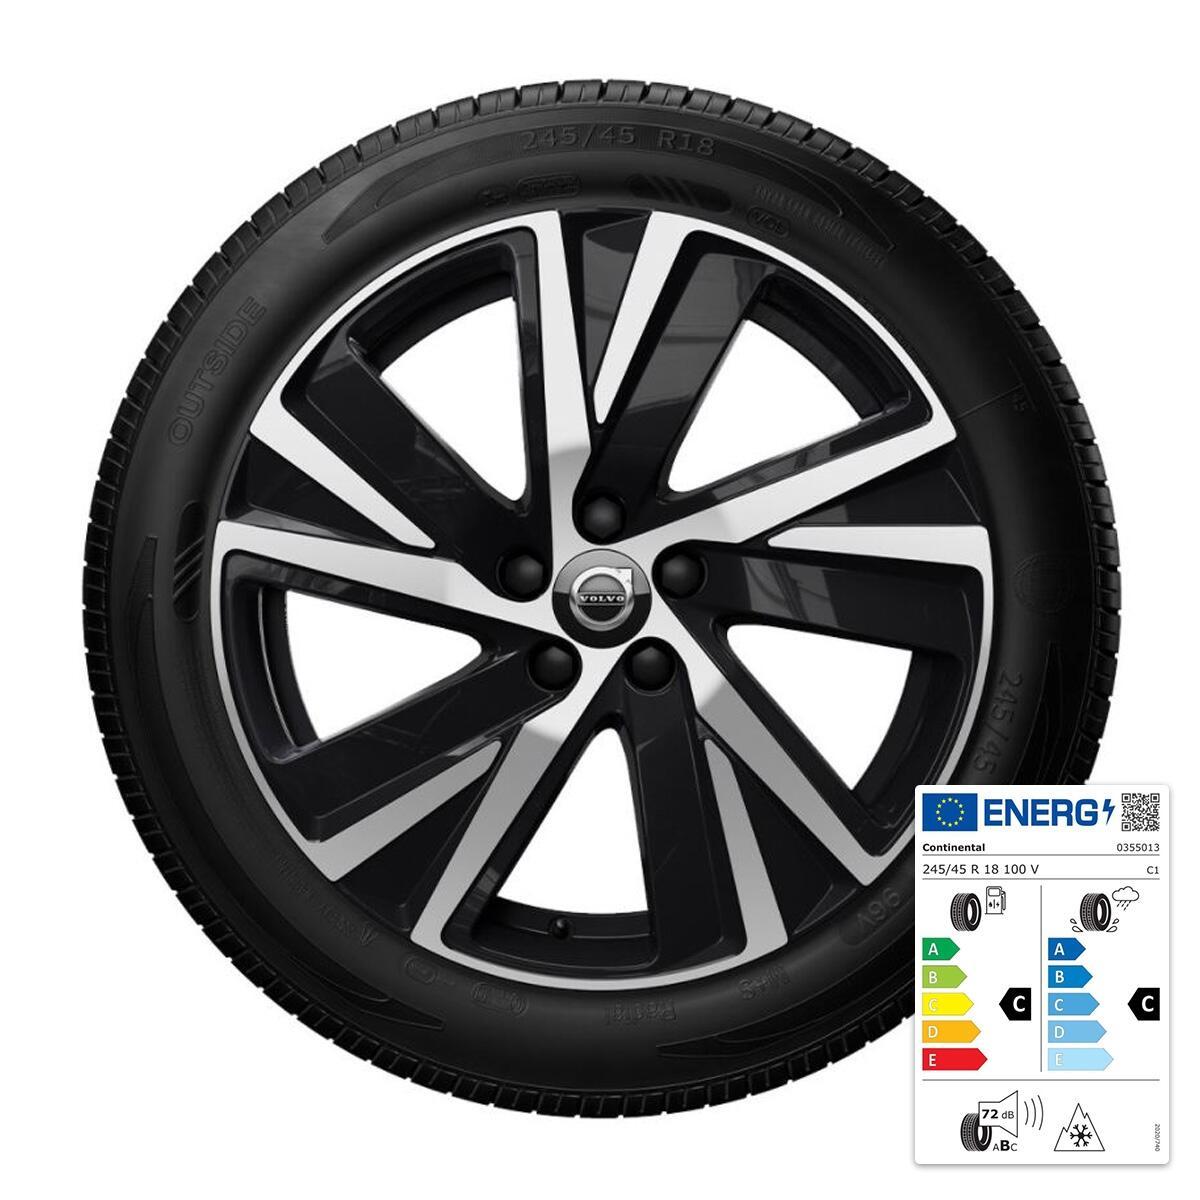 "Komplet zimskih koles:  45,70 cm (18""), pnevmatike  Continental"